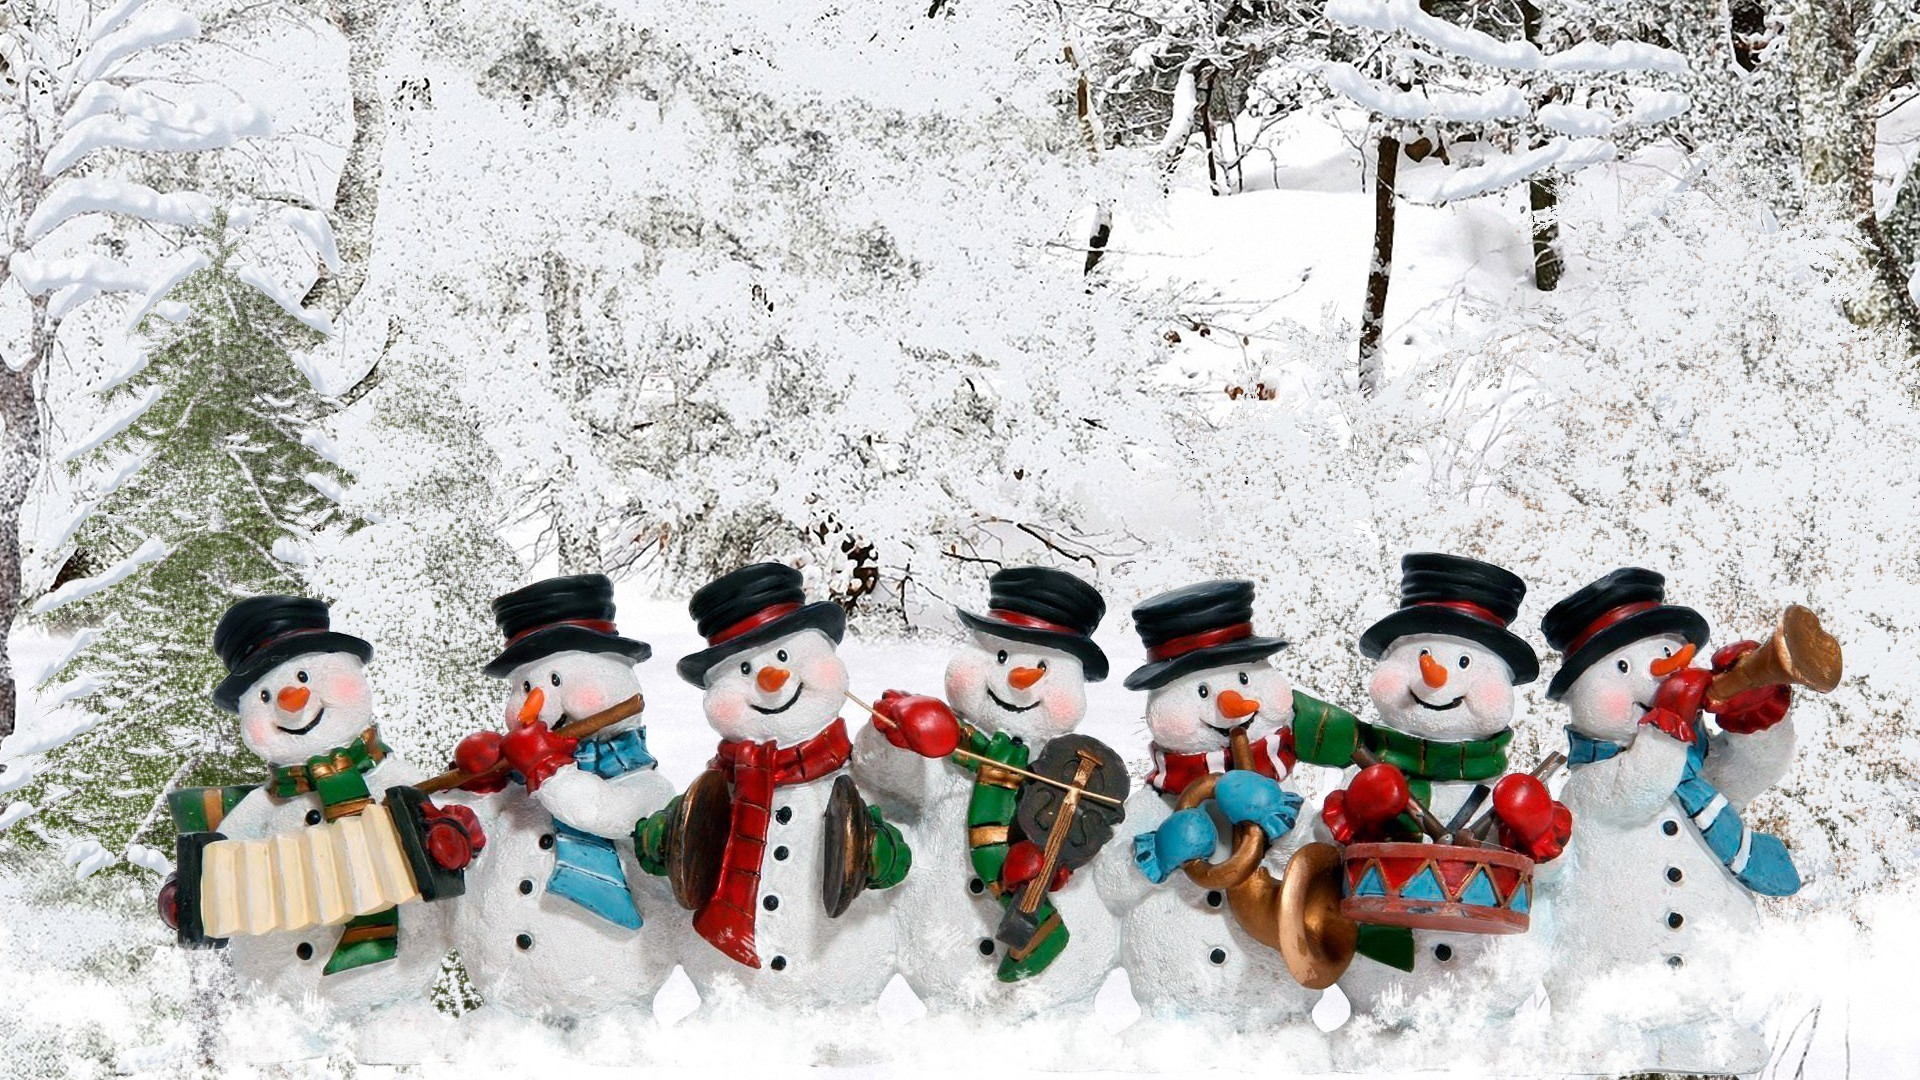 Cute Whimsical Snowman Snowmen Snow Winter Christmas Music Band Wallpaper  Trees